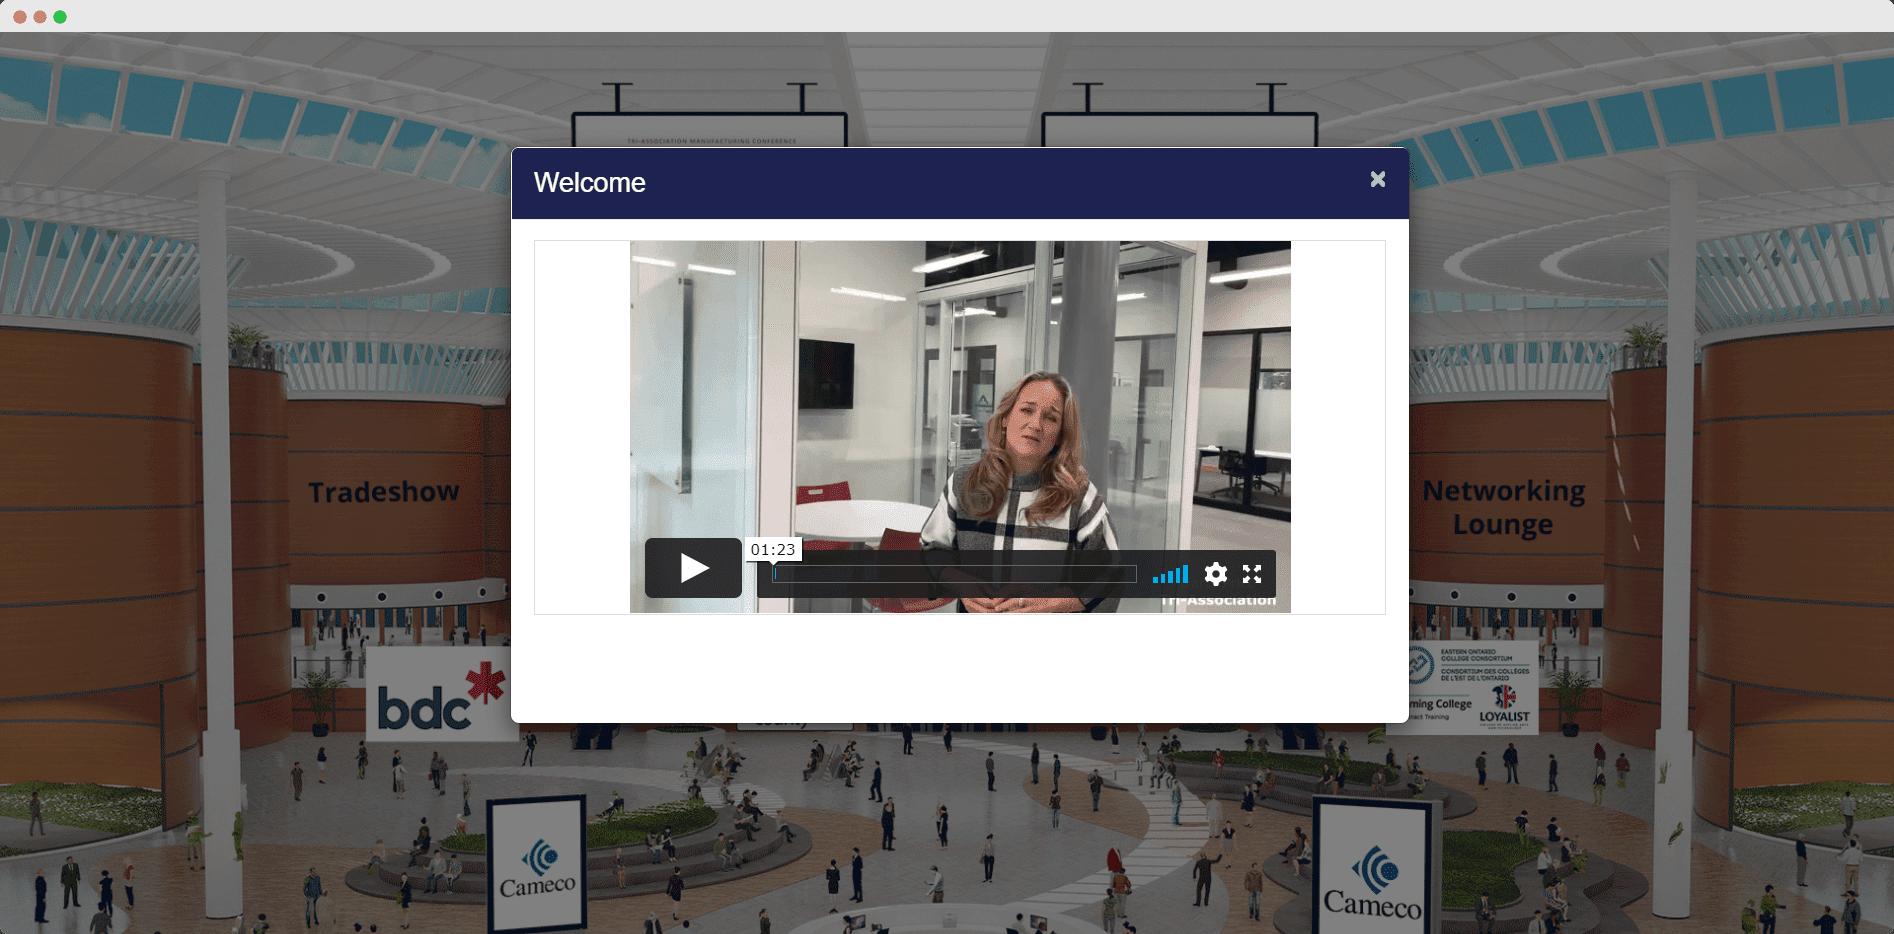 Virtual lobby welcome video